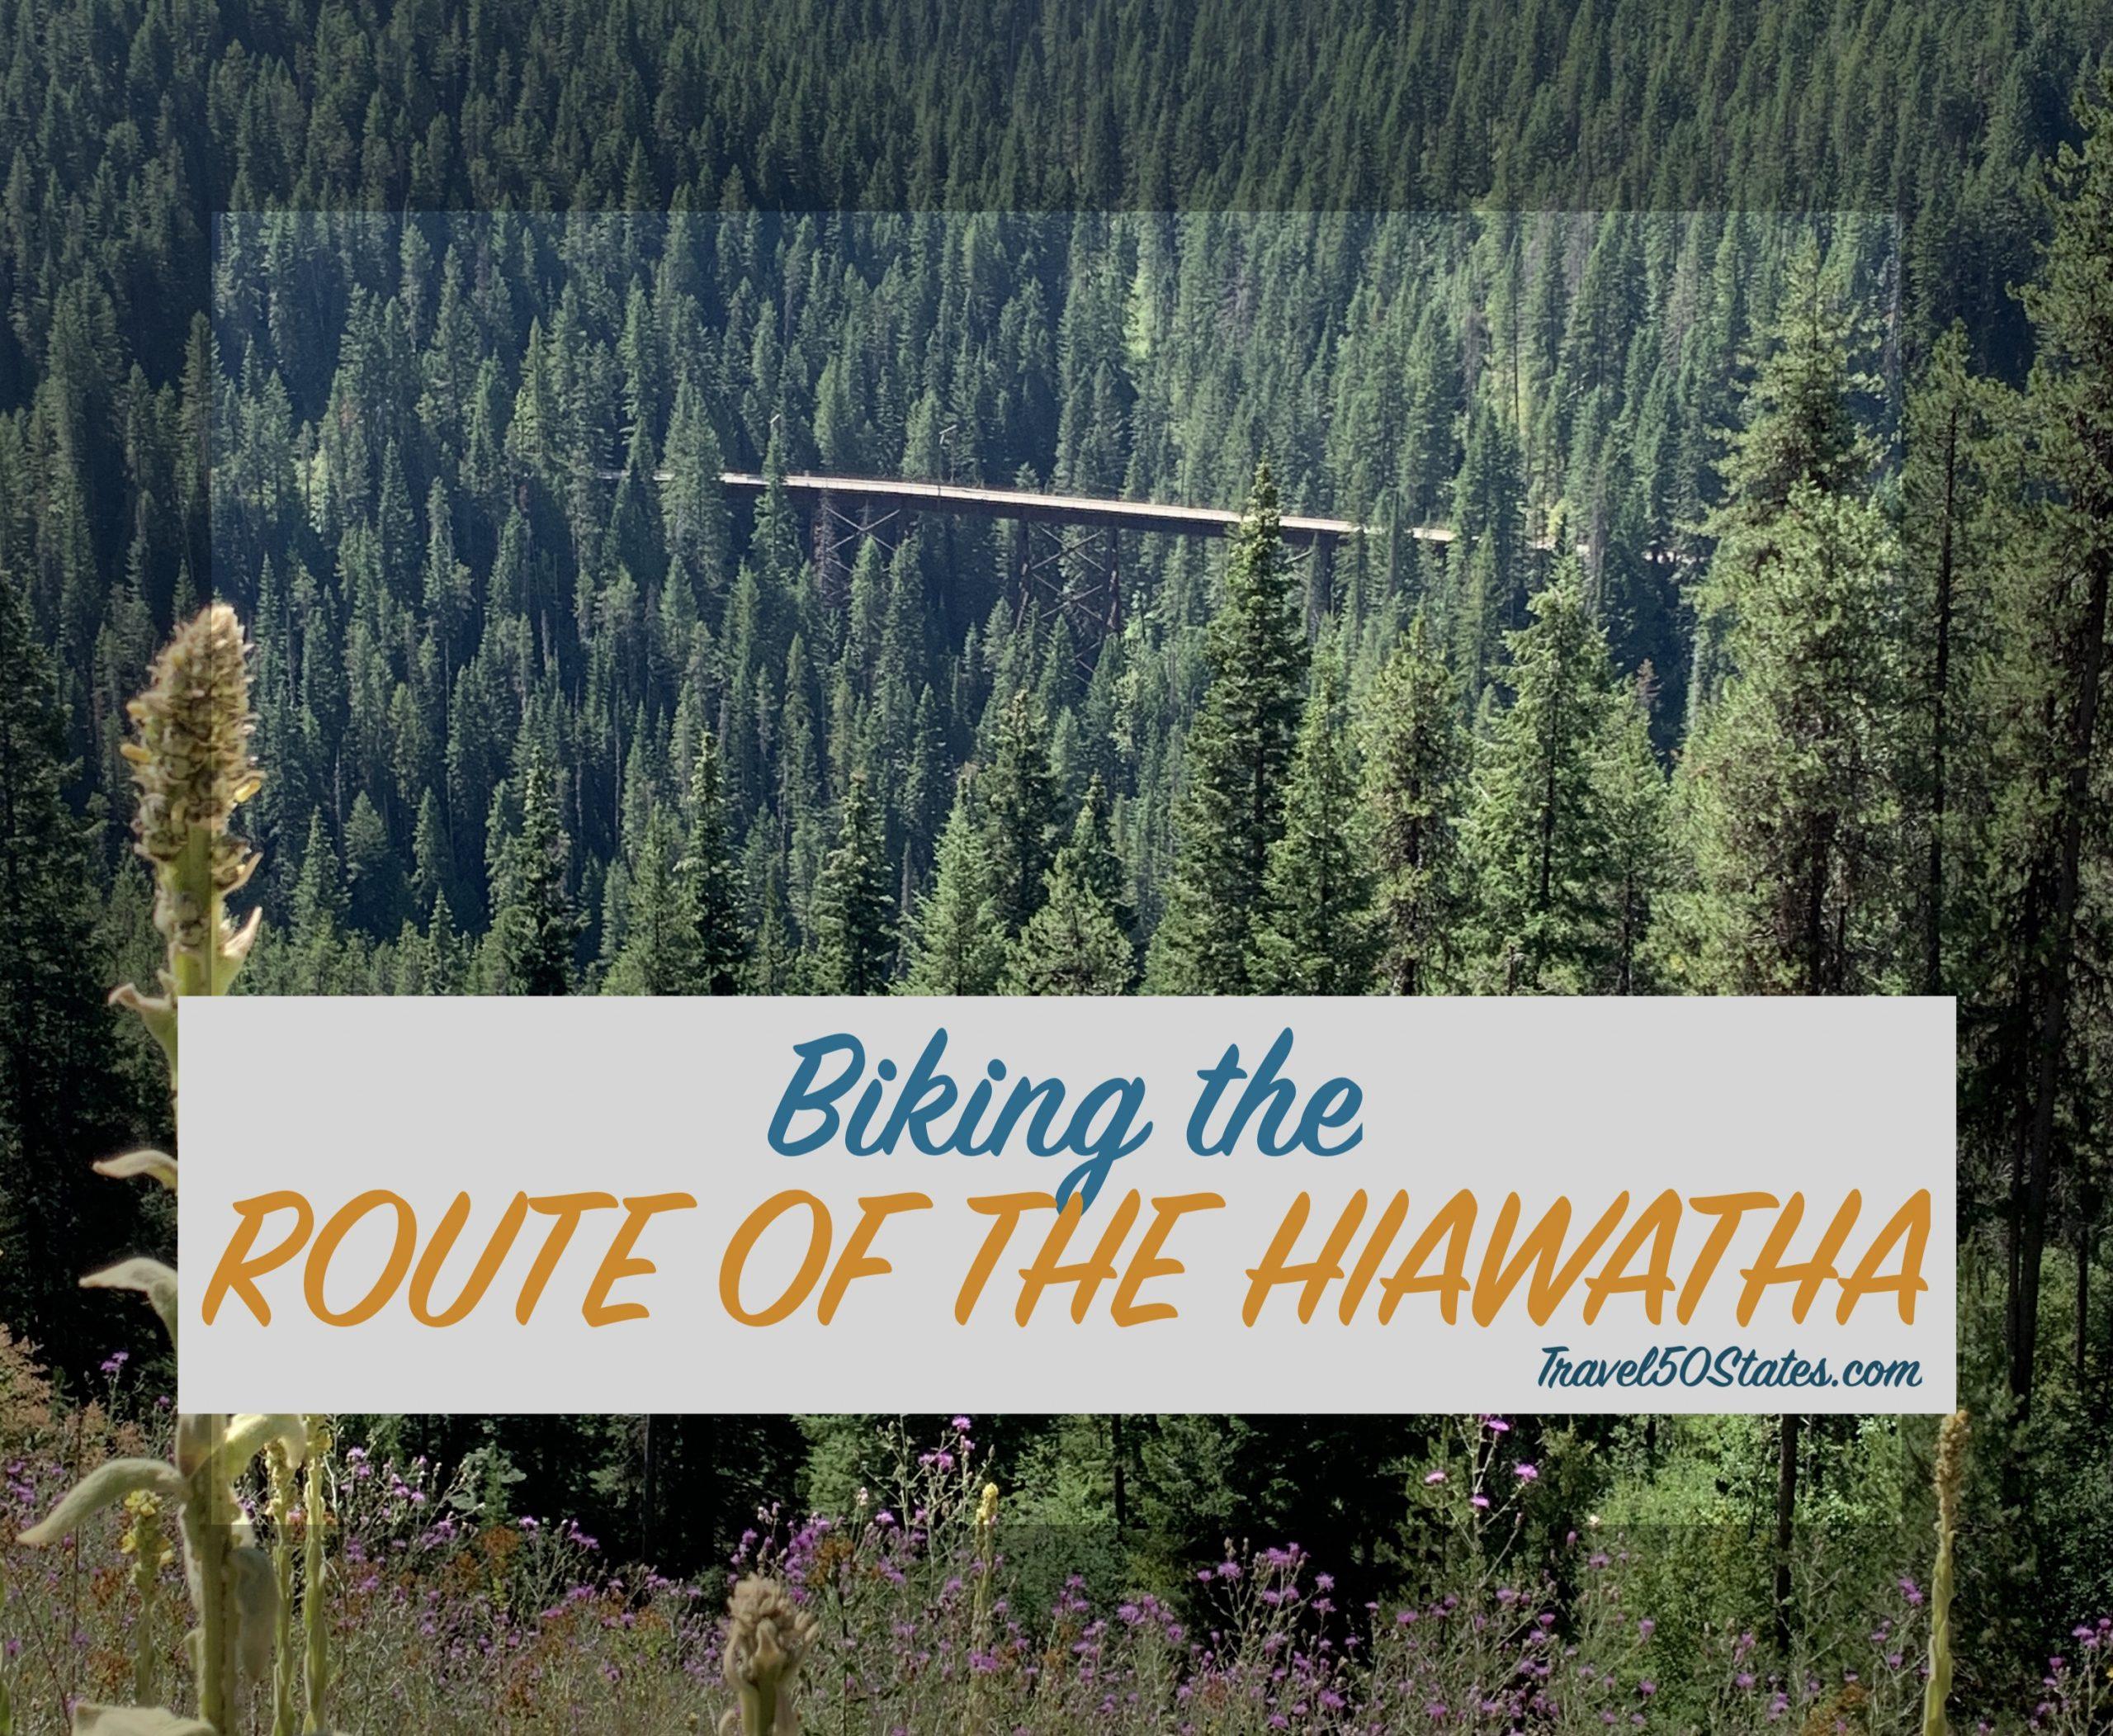 Biking the Route of the Hiawatha